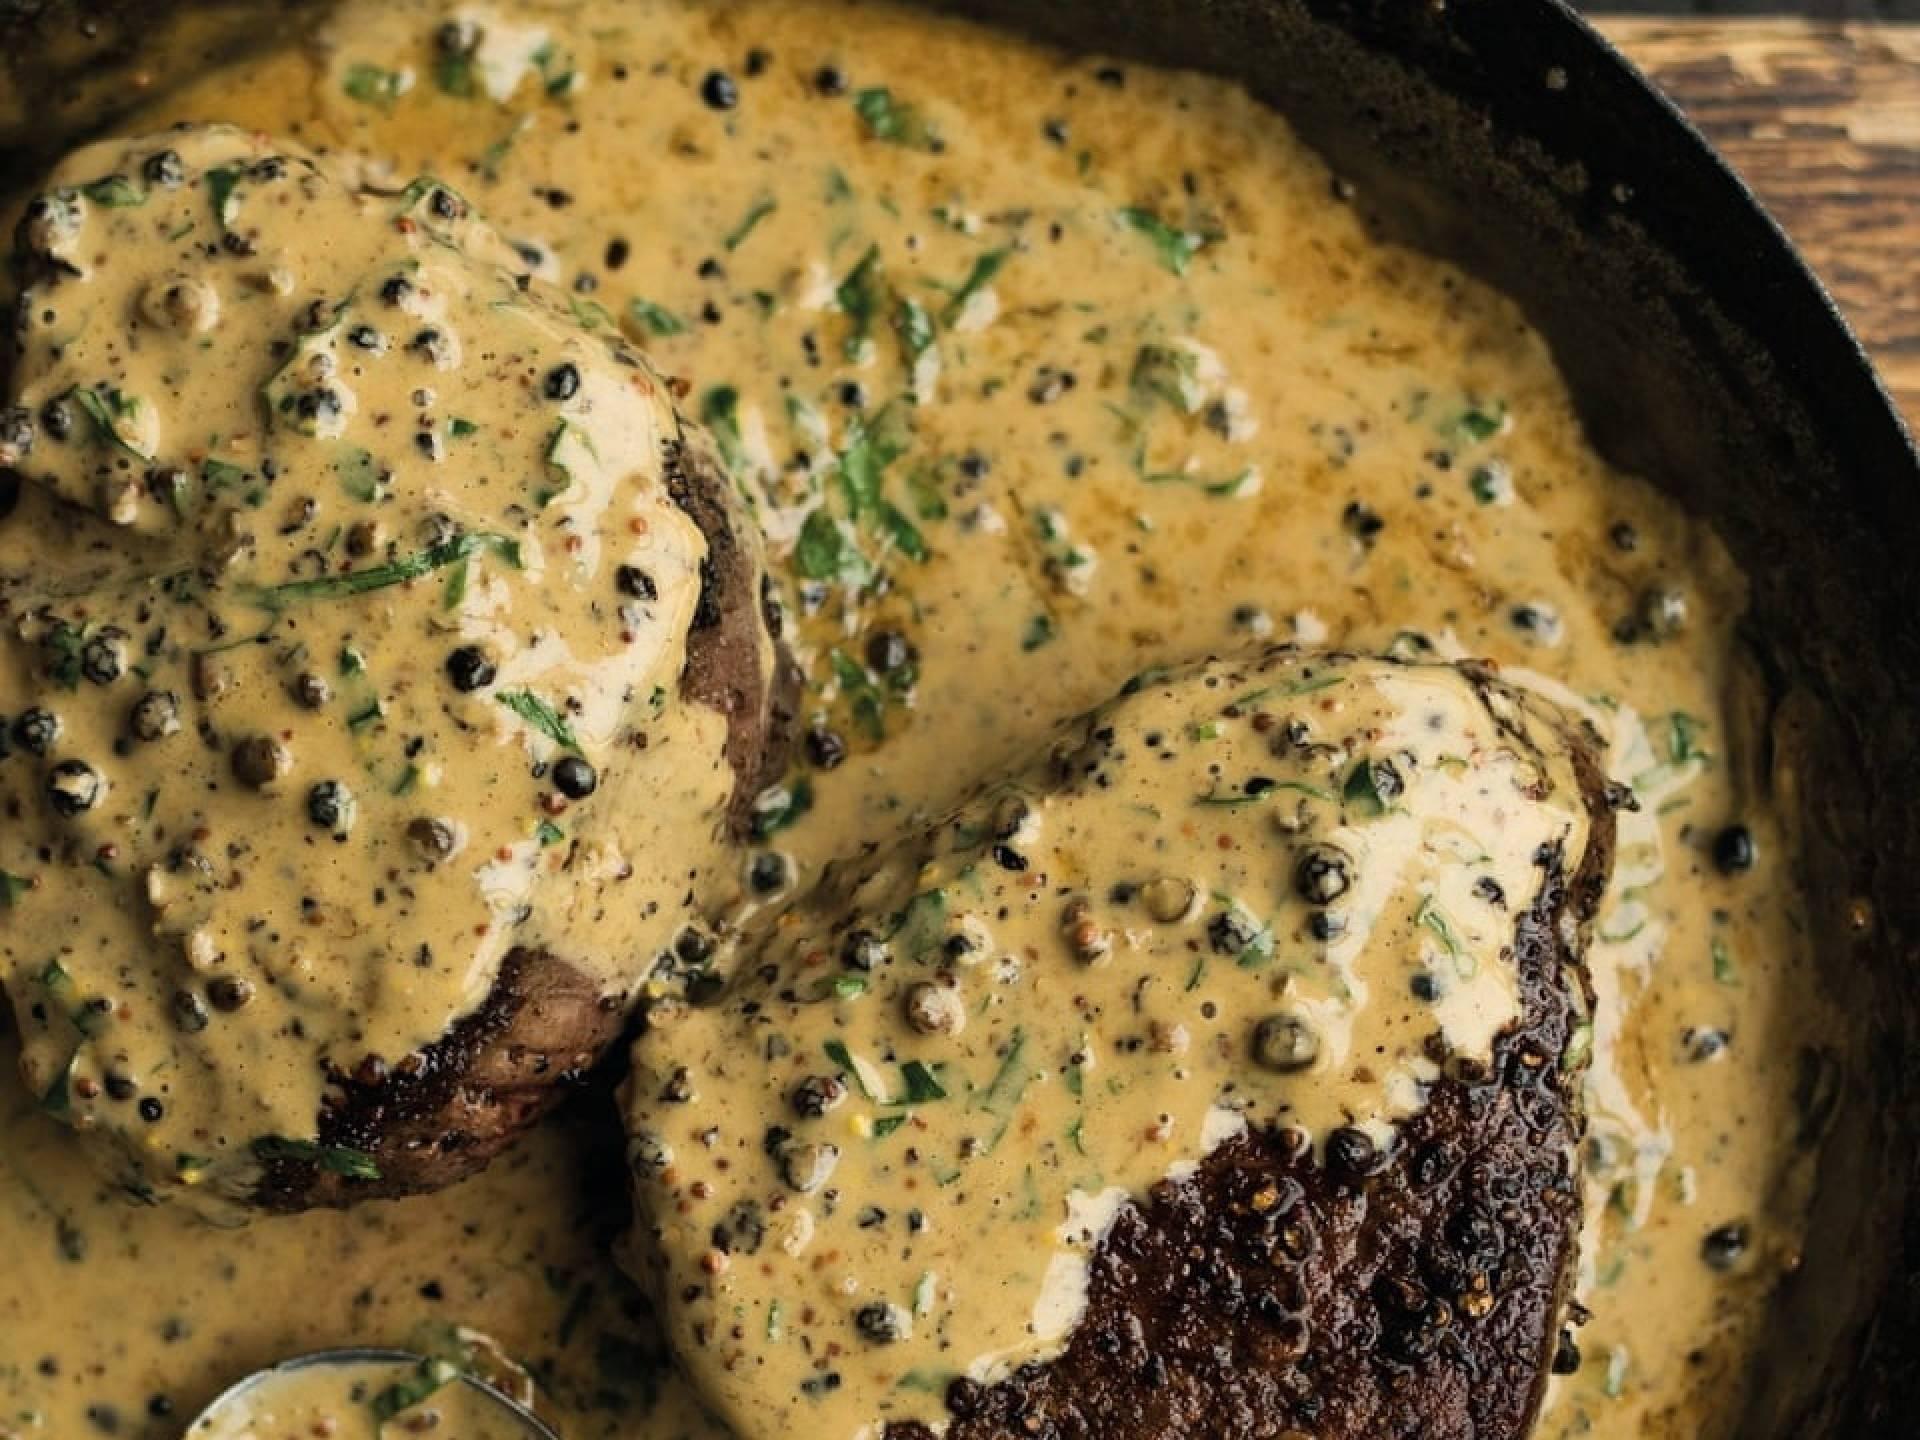 Grilled Steak with Peppercorn Gravy